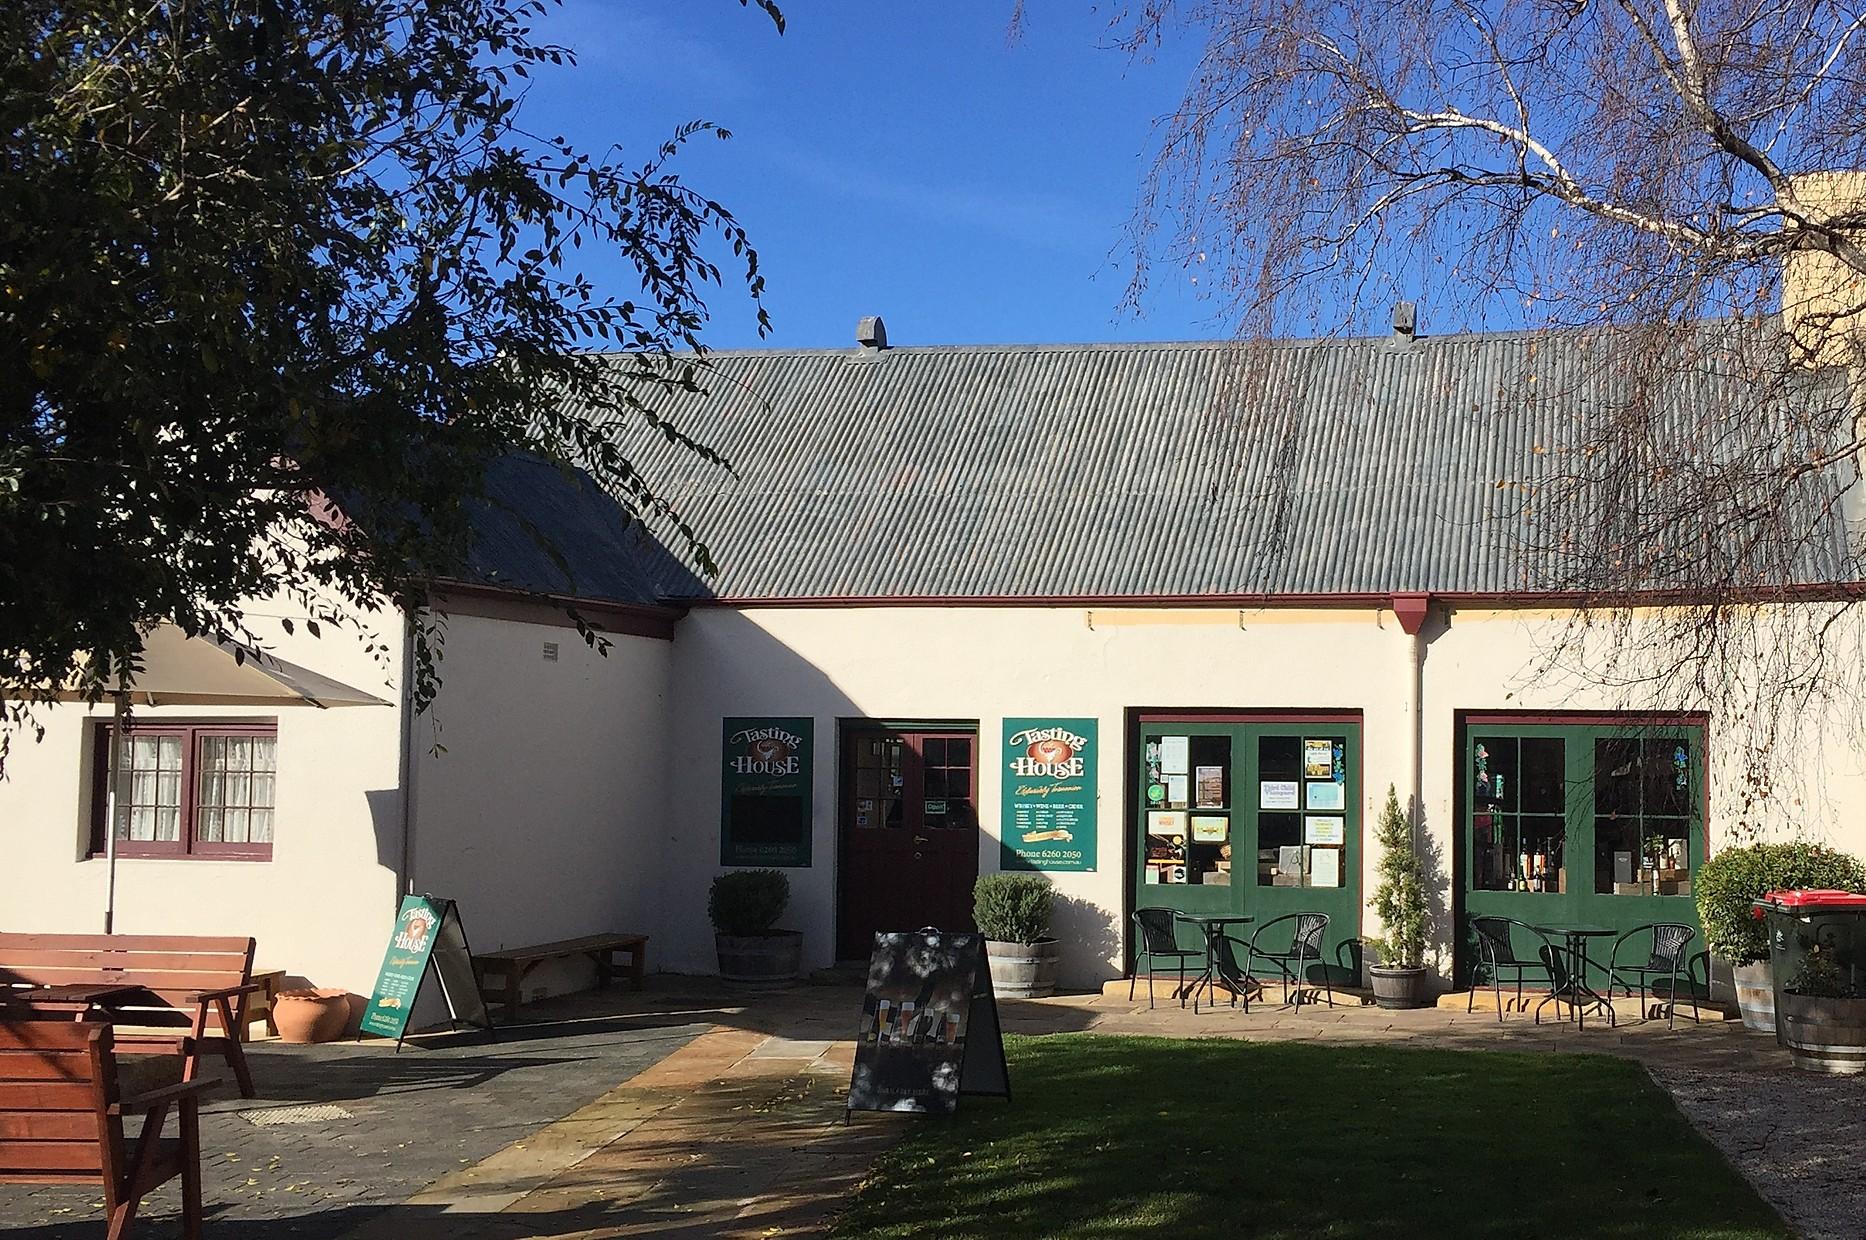 Richmond — Тасмания 2018 — Блог о путешествиях Сергея Чеботова